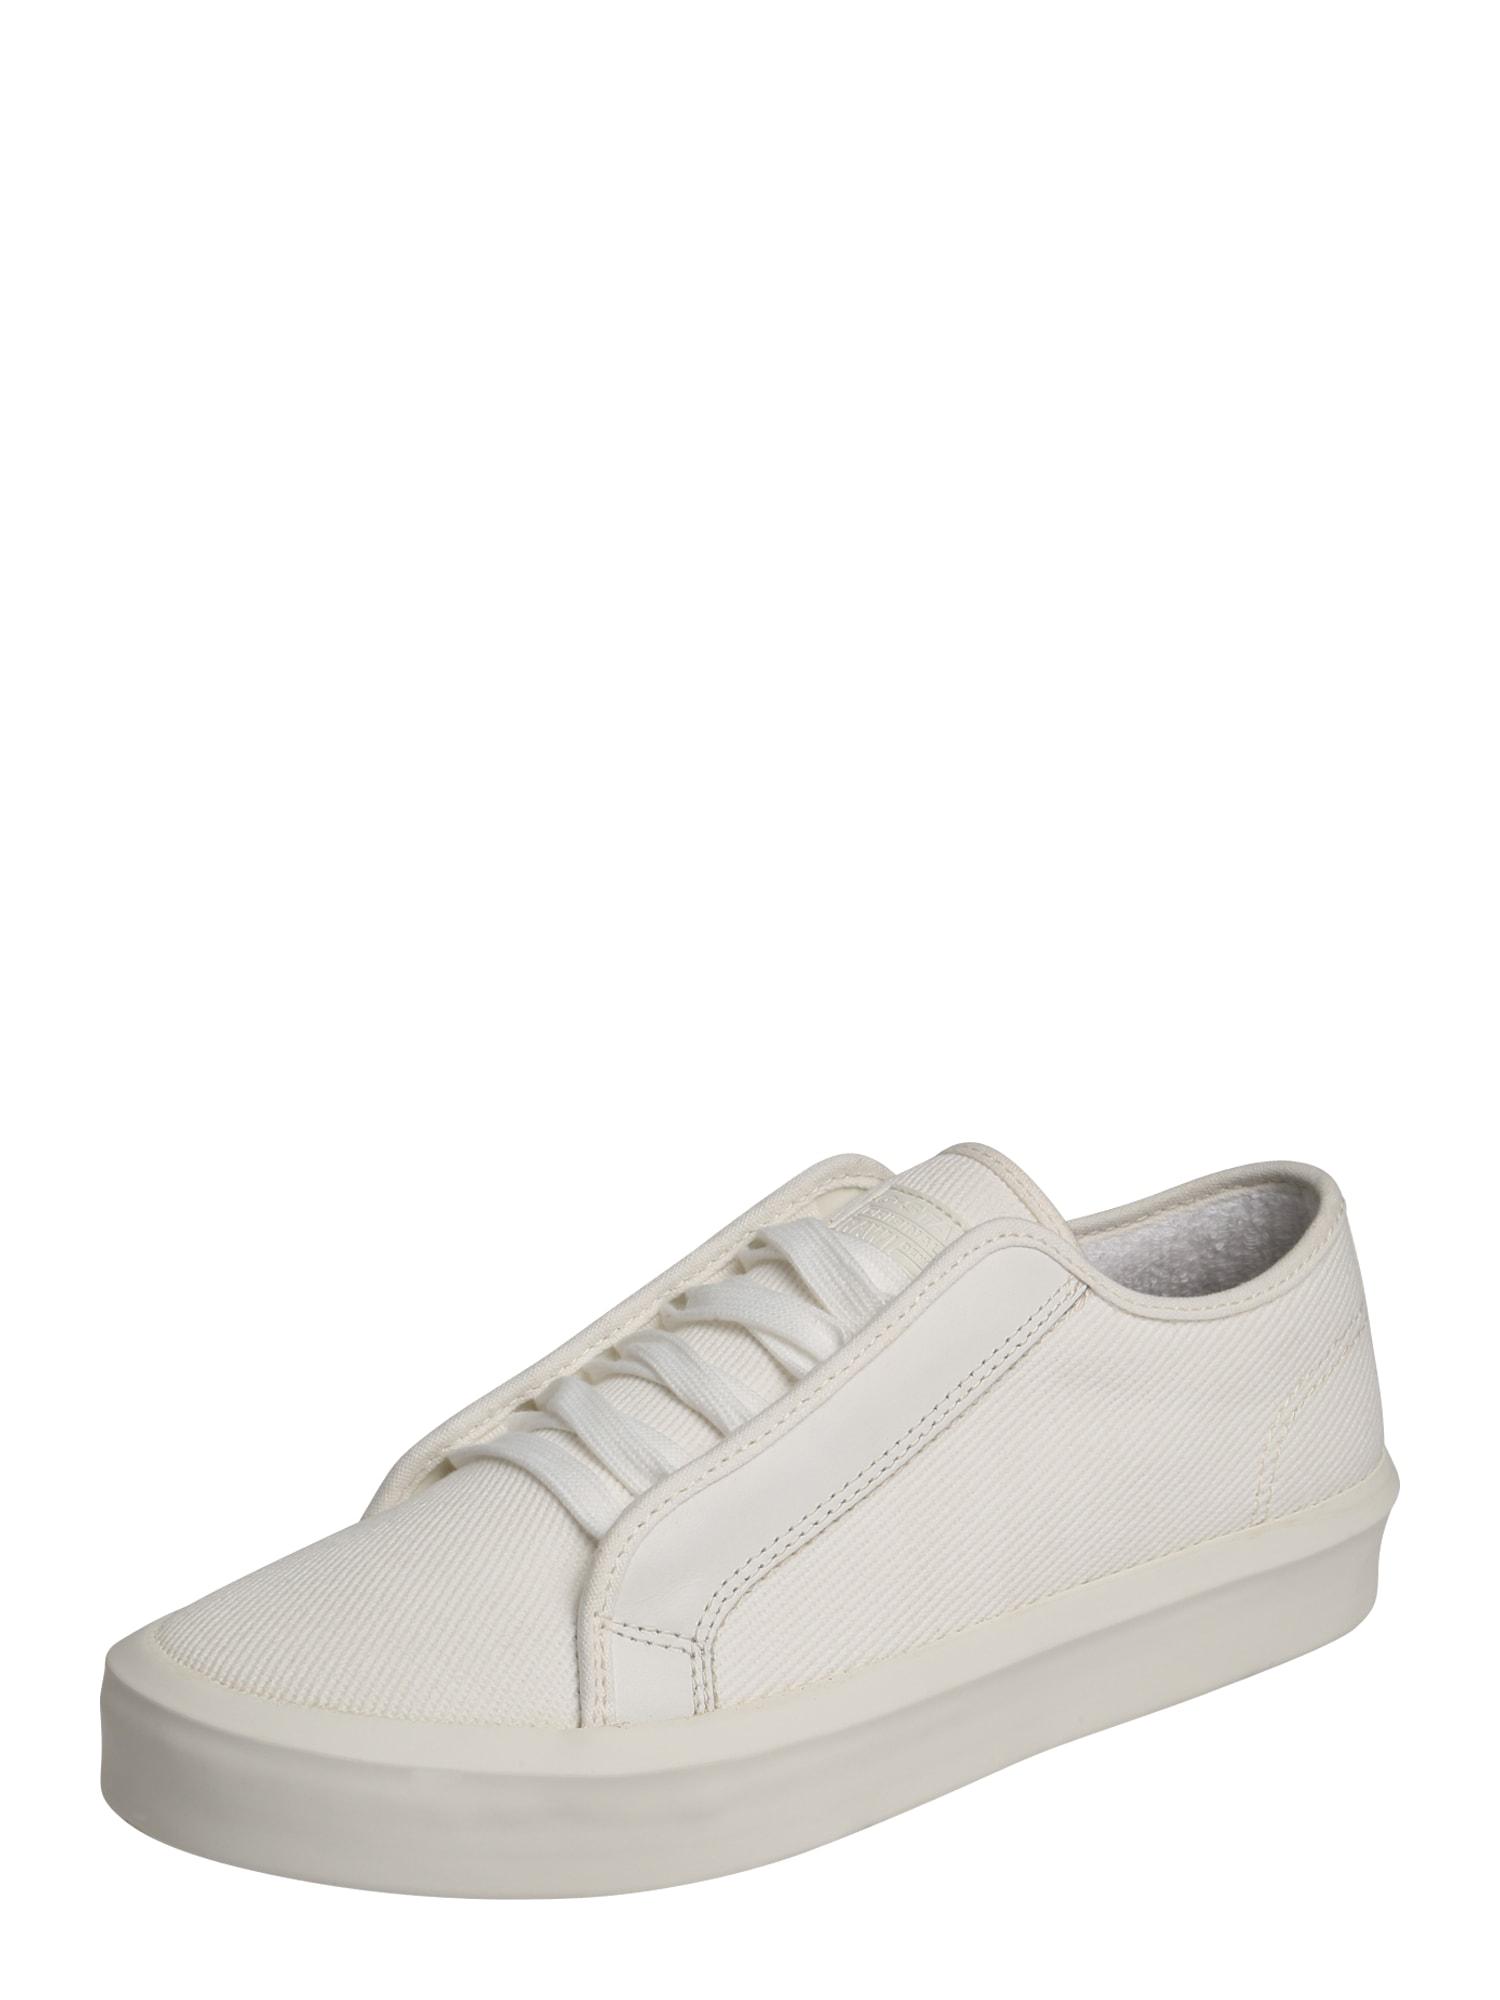 G-STAR RAW Heren Sneakers laag Strett low wit